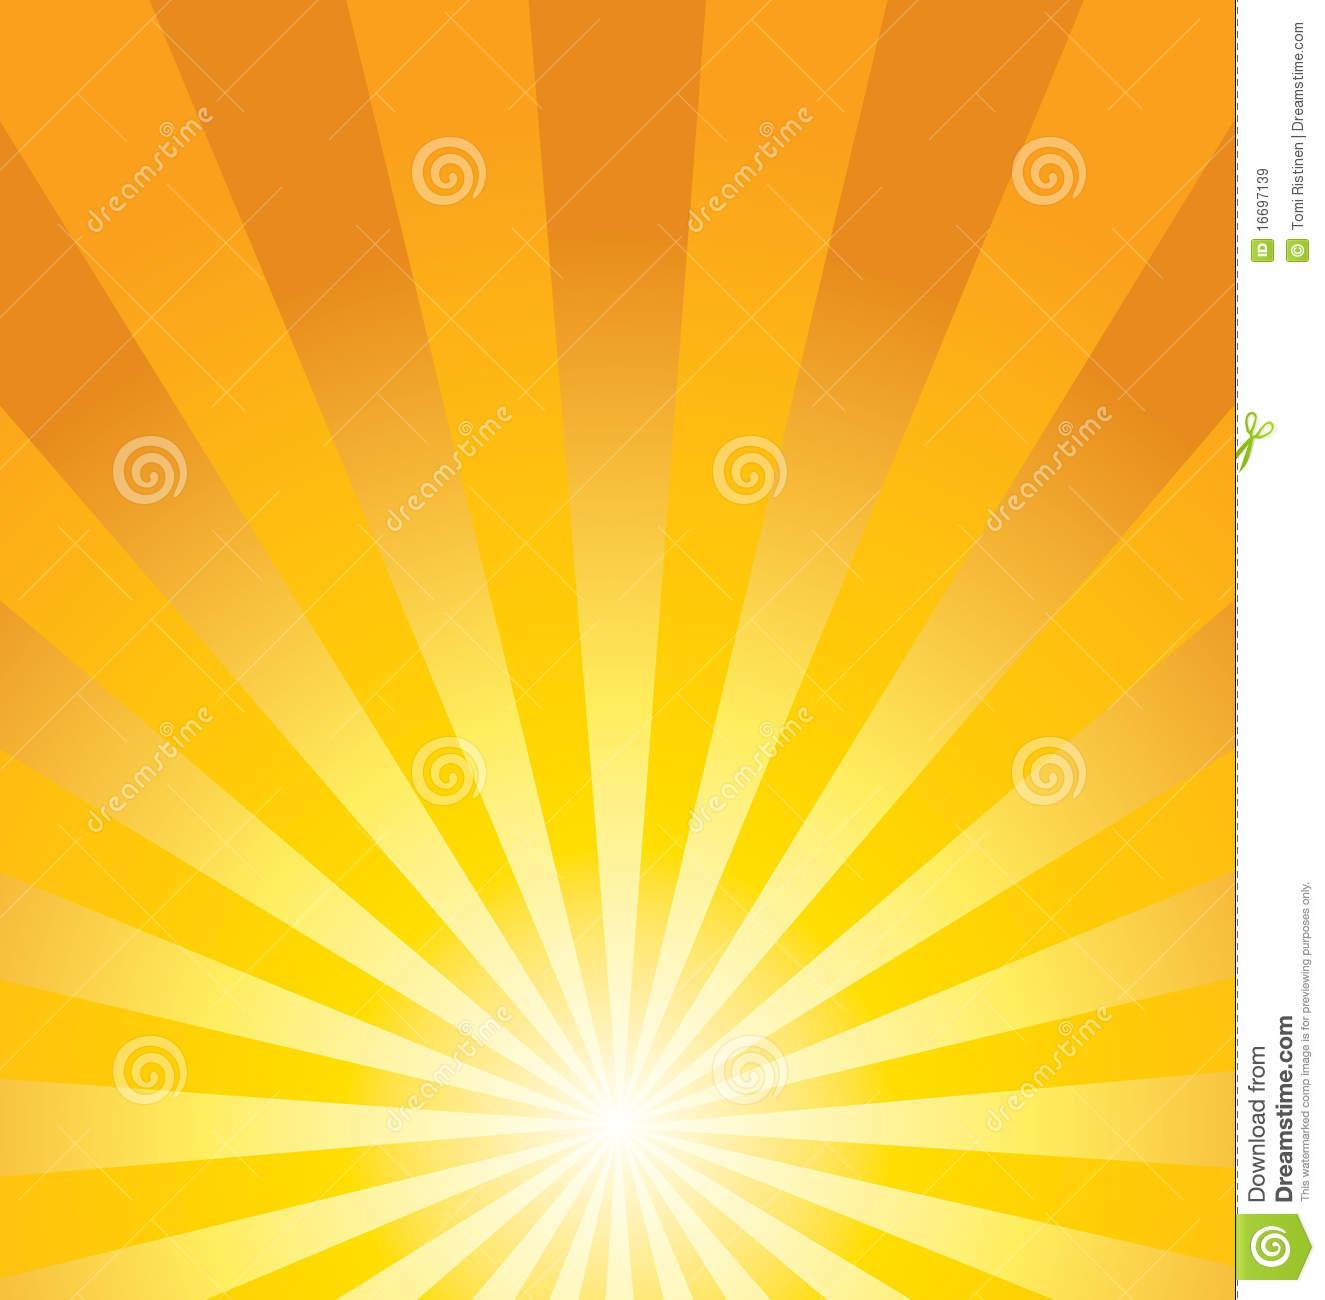 Sun Background Royalty Free Stock Images - Image: 16697139